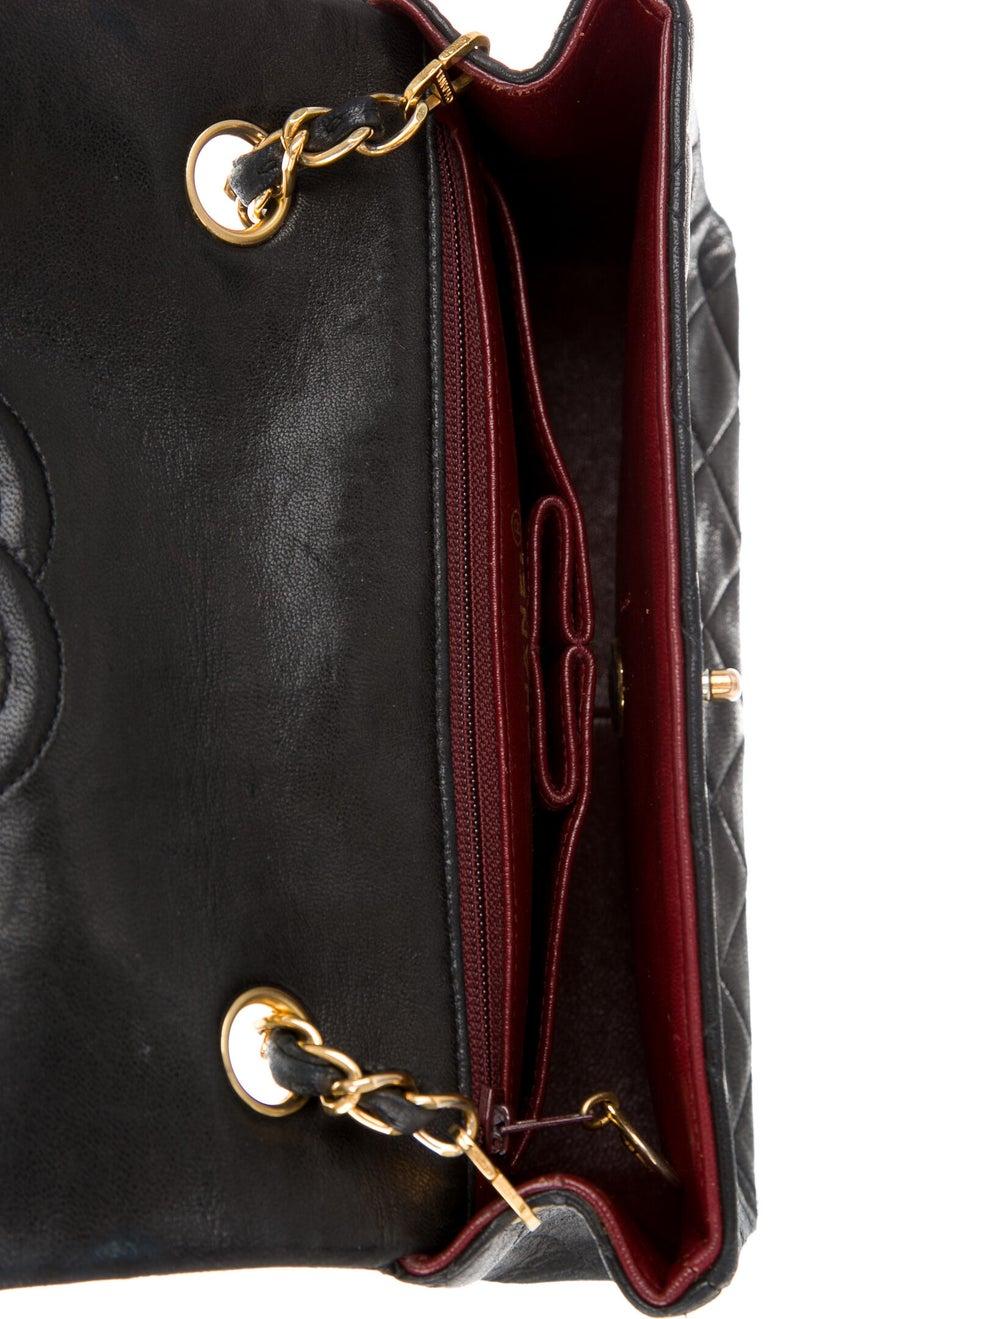 Chanel Vintage Classic Small Single Flap Bag Blue - image 5